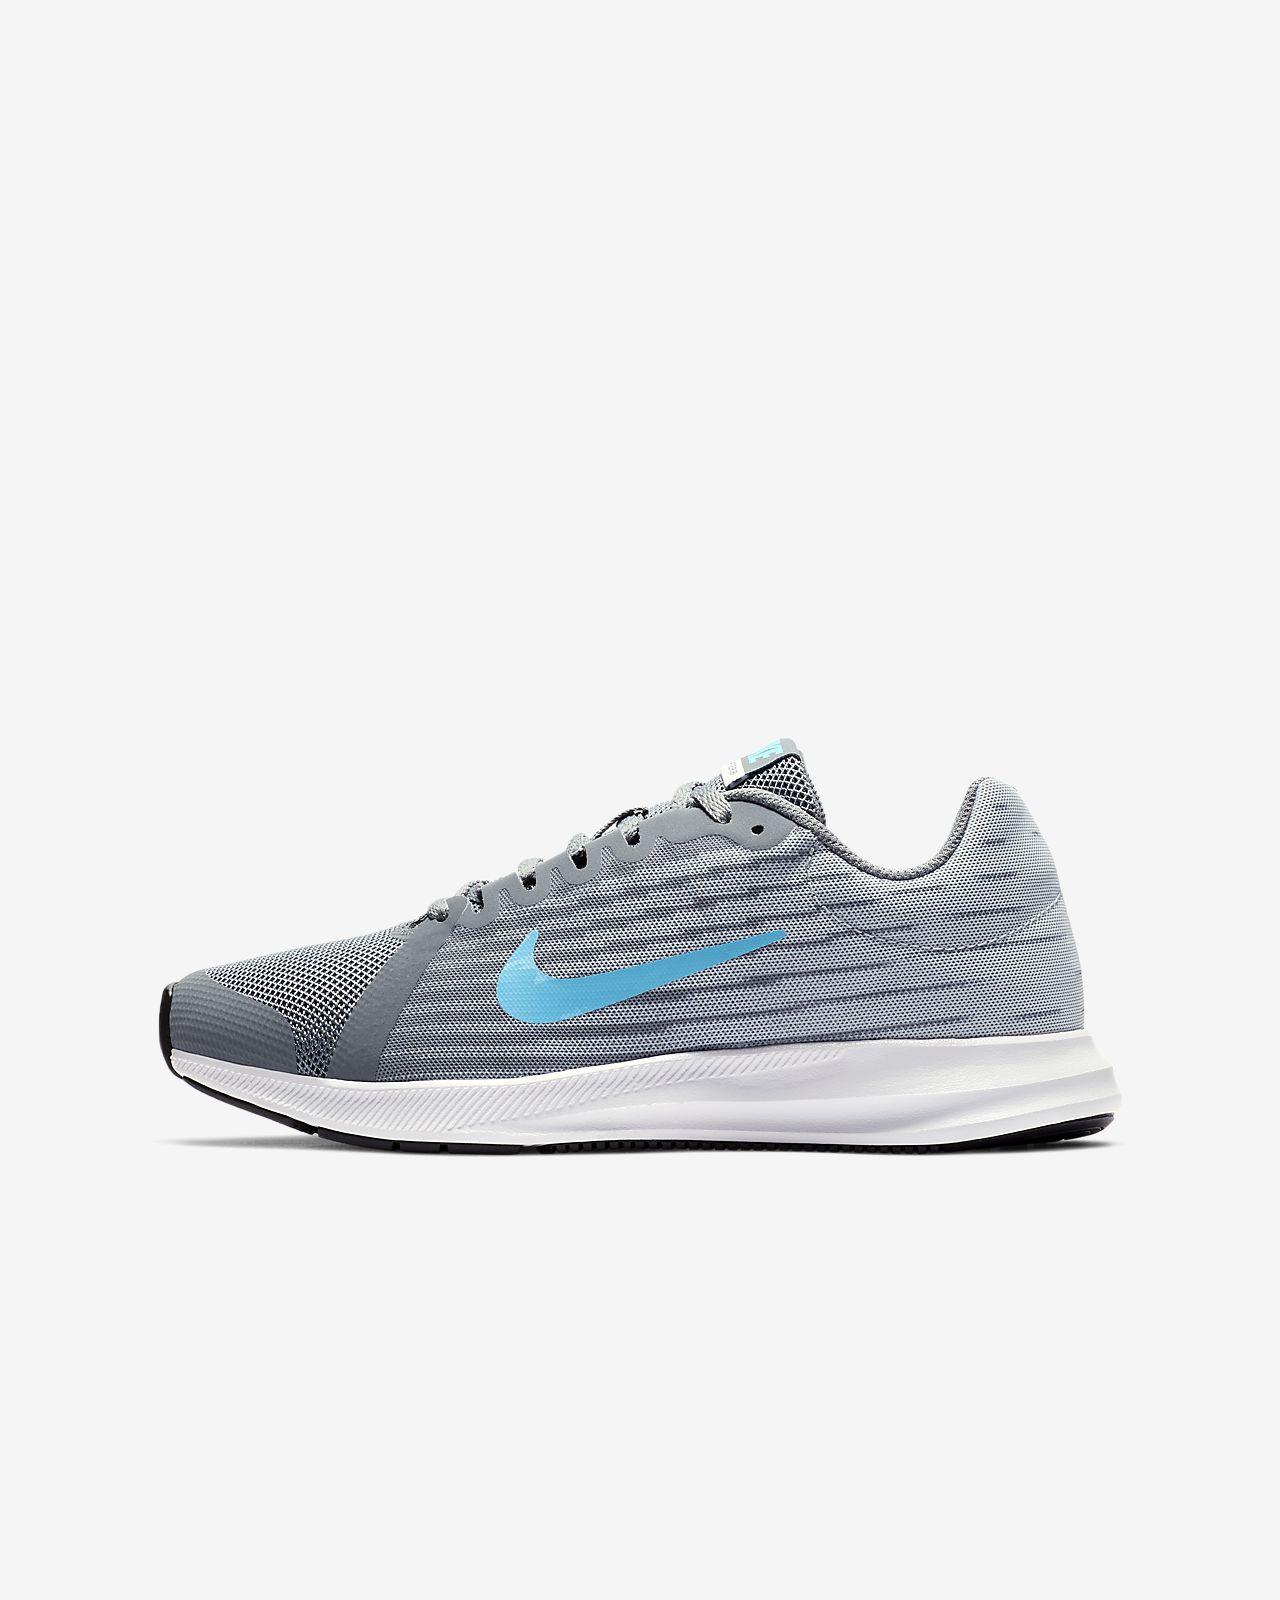 9580d3436b5 Calzado de running para niños talla grande Nike Downshifter 8. Nike ...